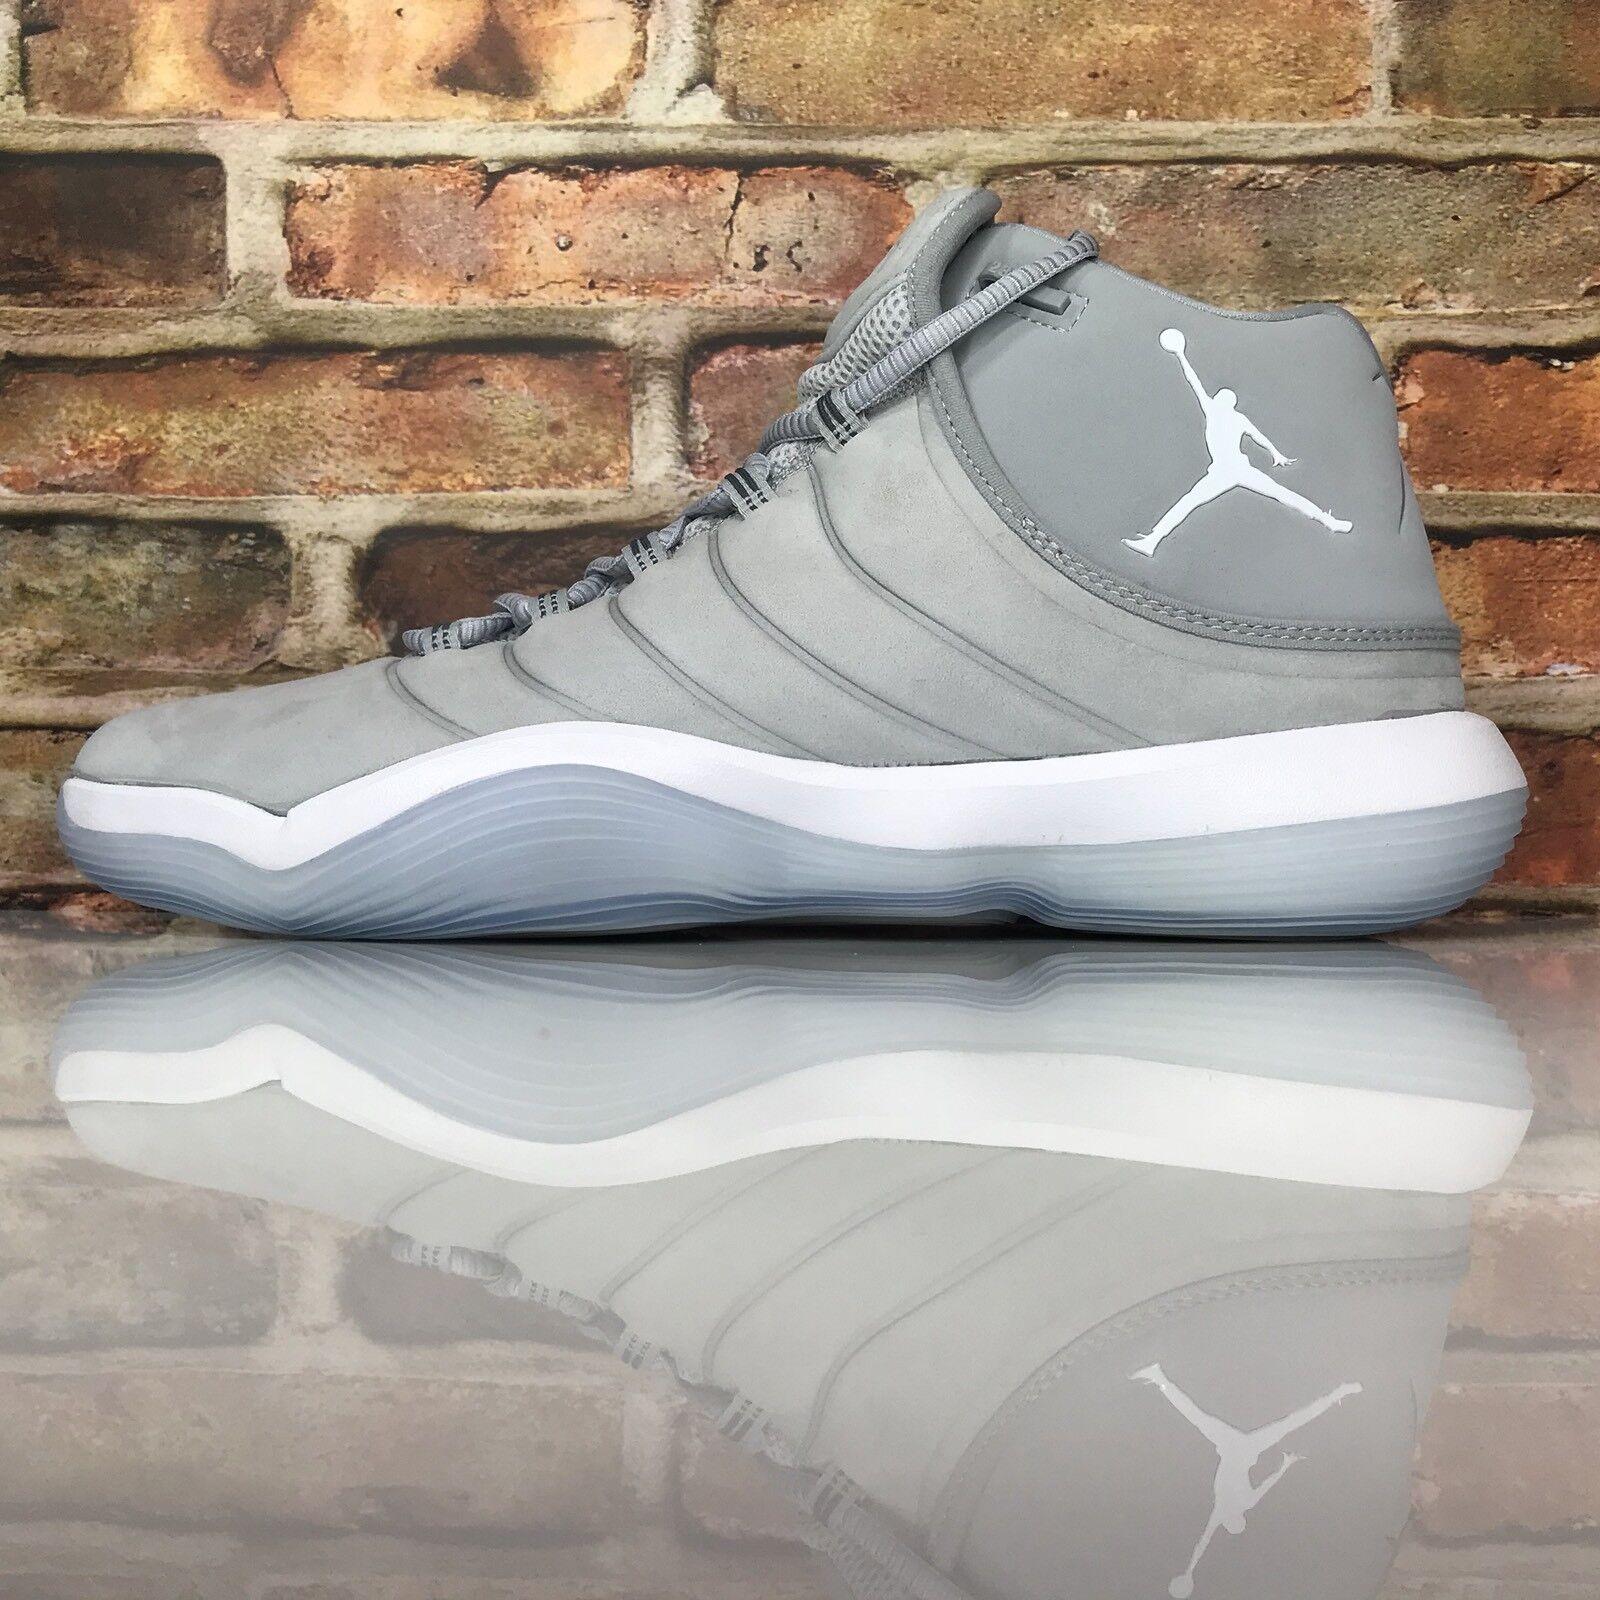 Air Jordan Super Fly 2017 Uomo Size 11 11 11 Basketball Shoes Wolf Grey Platinum 229b2e